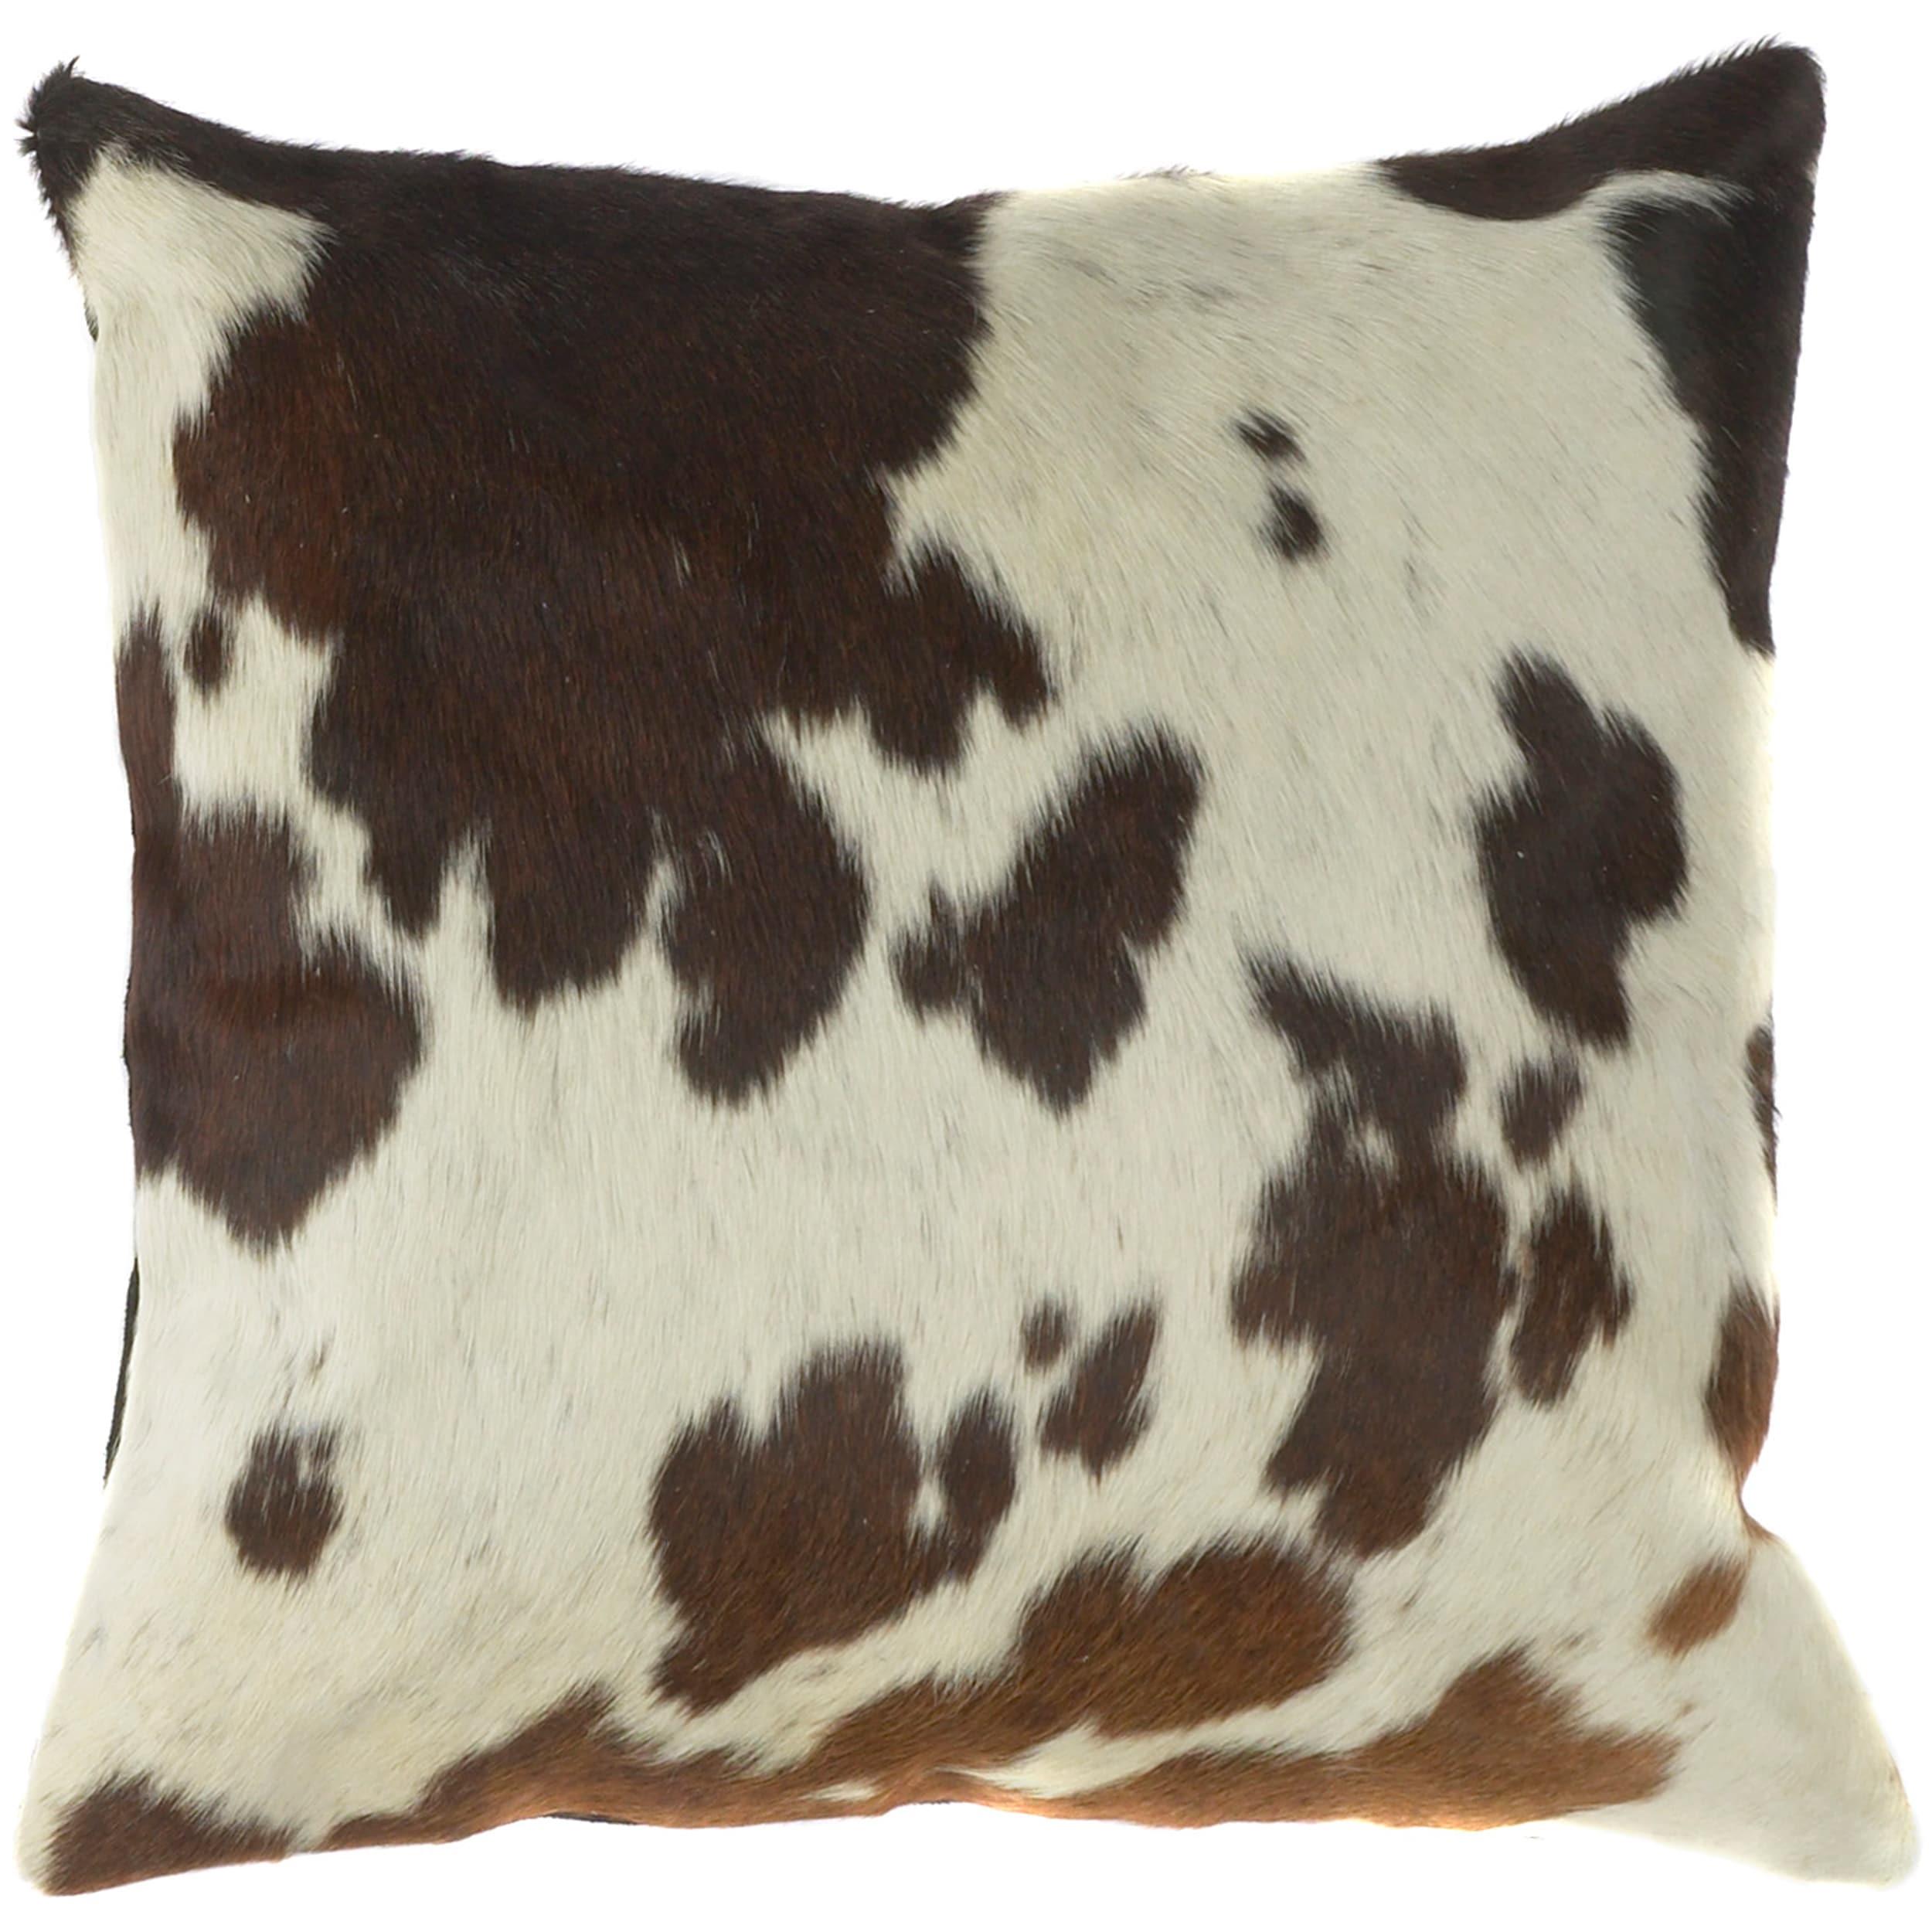 Decorative Merrimack Pillow